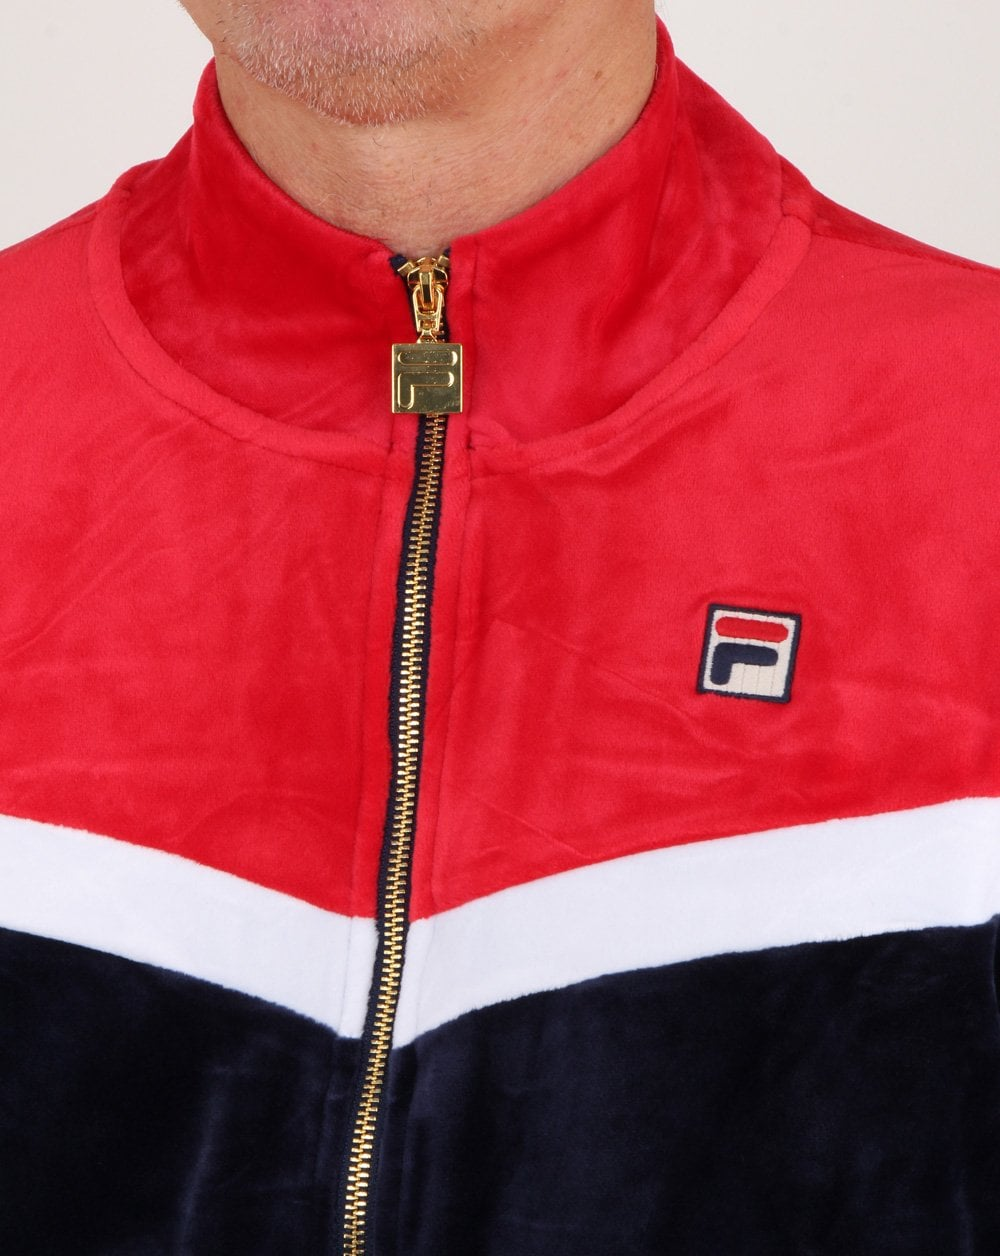 ee625164 Fila Vintage Harry Velour Track Top Navy/red/white, Mens, Track,Velour